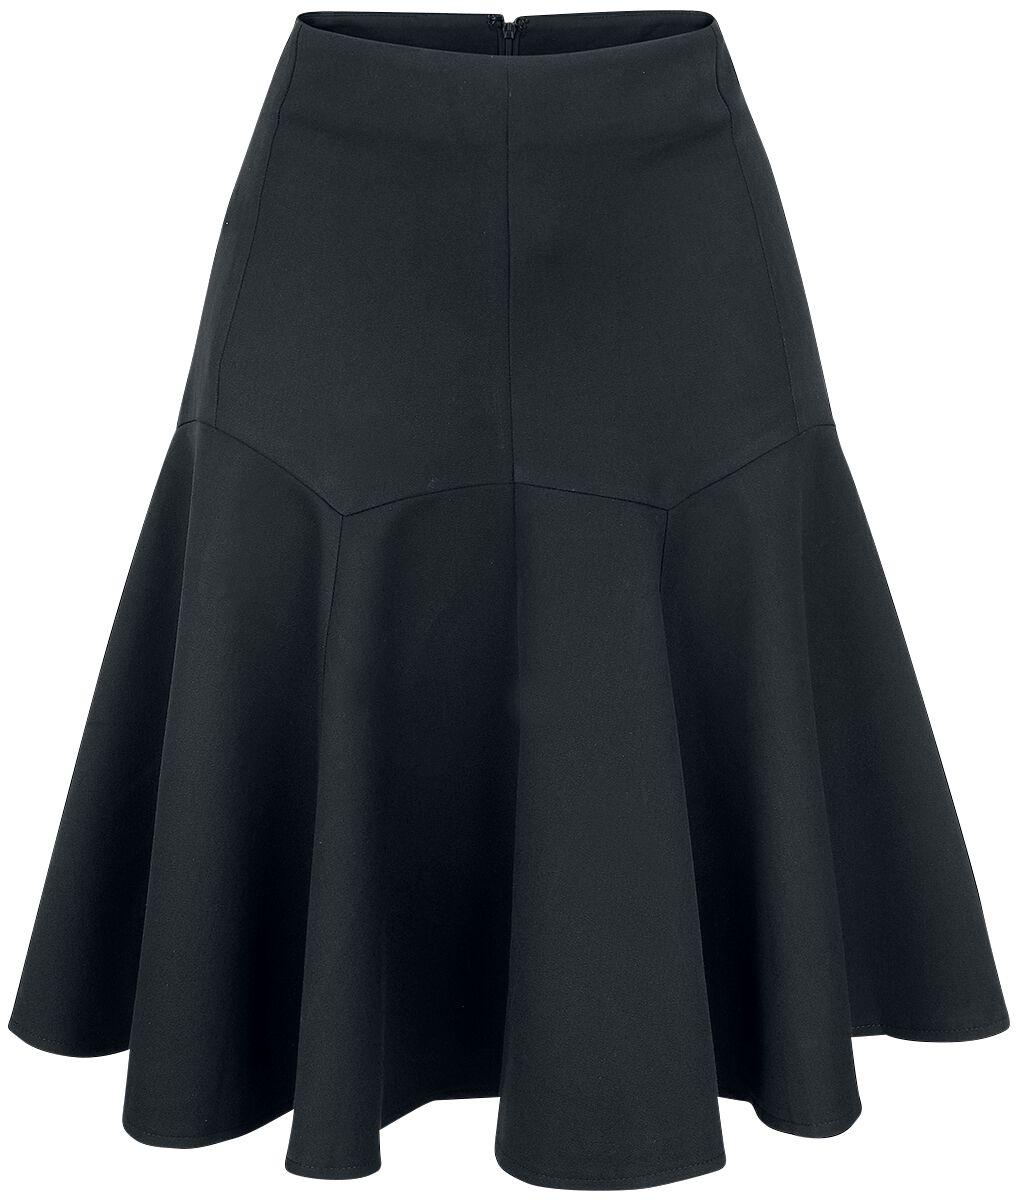 Dancing Days Sophia Skirt Spódnica czarny